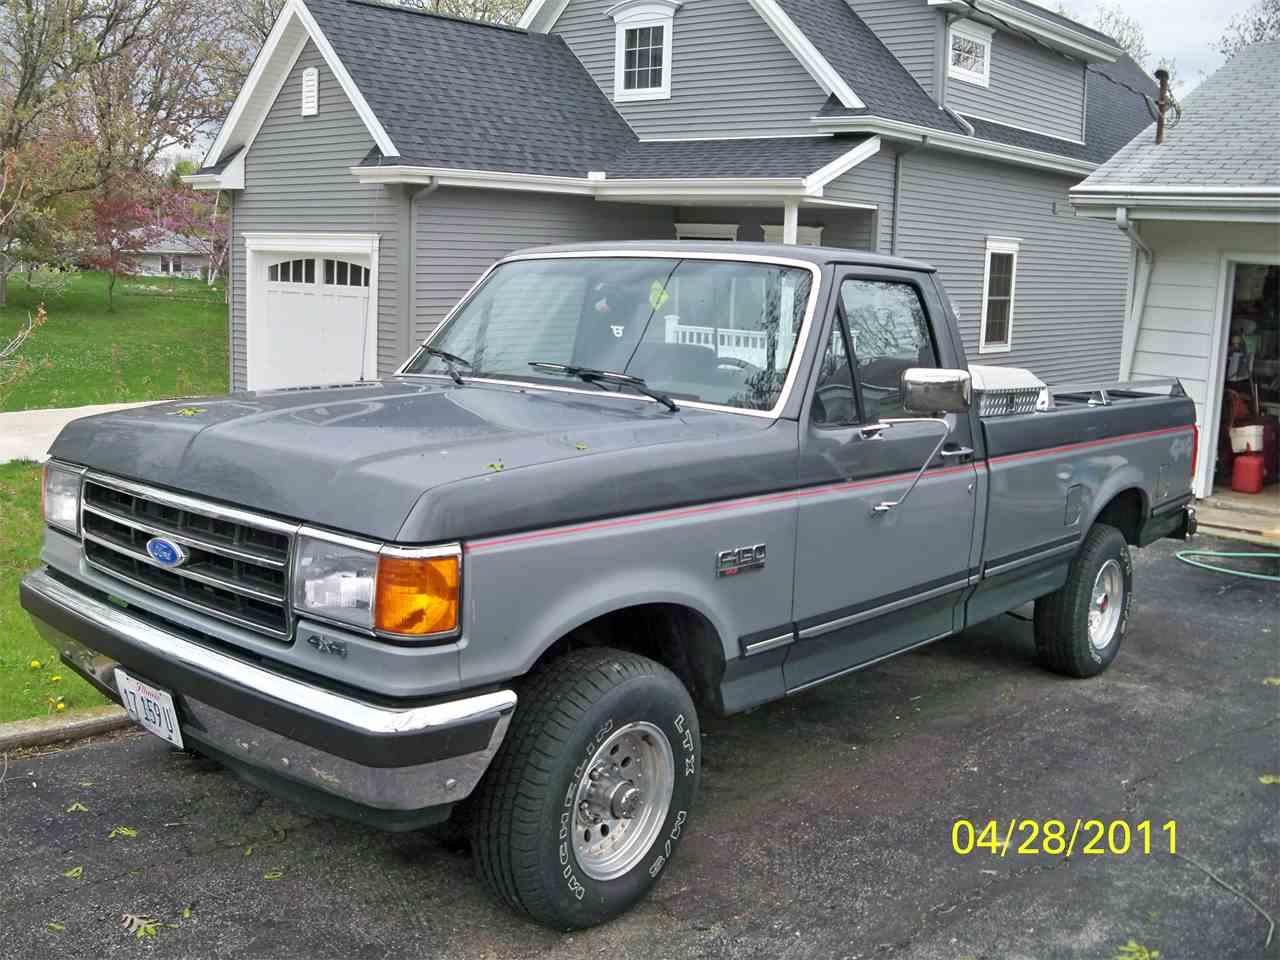 1991 Ford F150 for Sale | ClassicCars.com | CC-557107